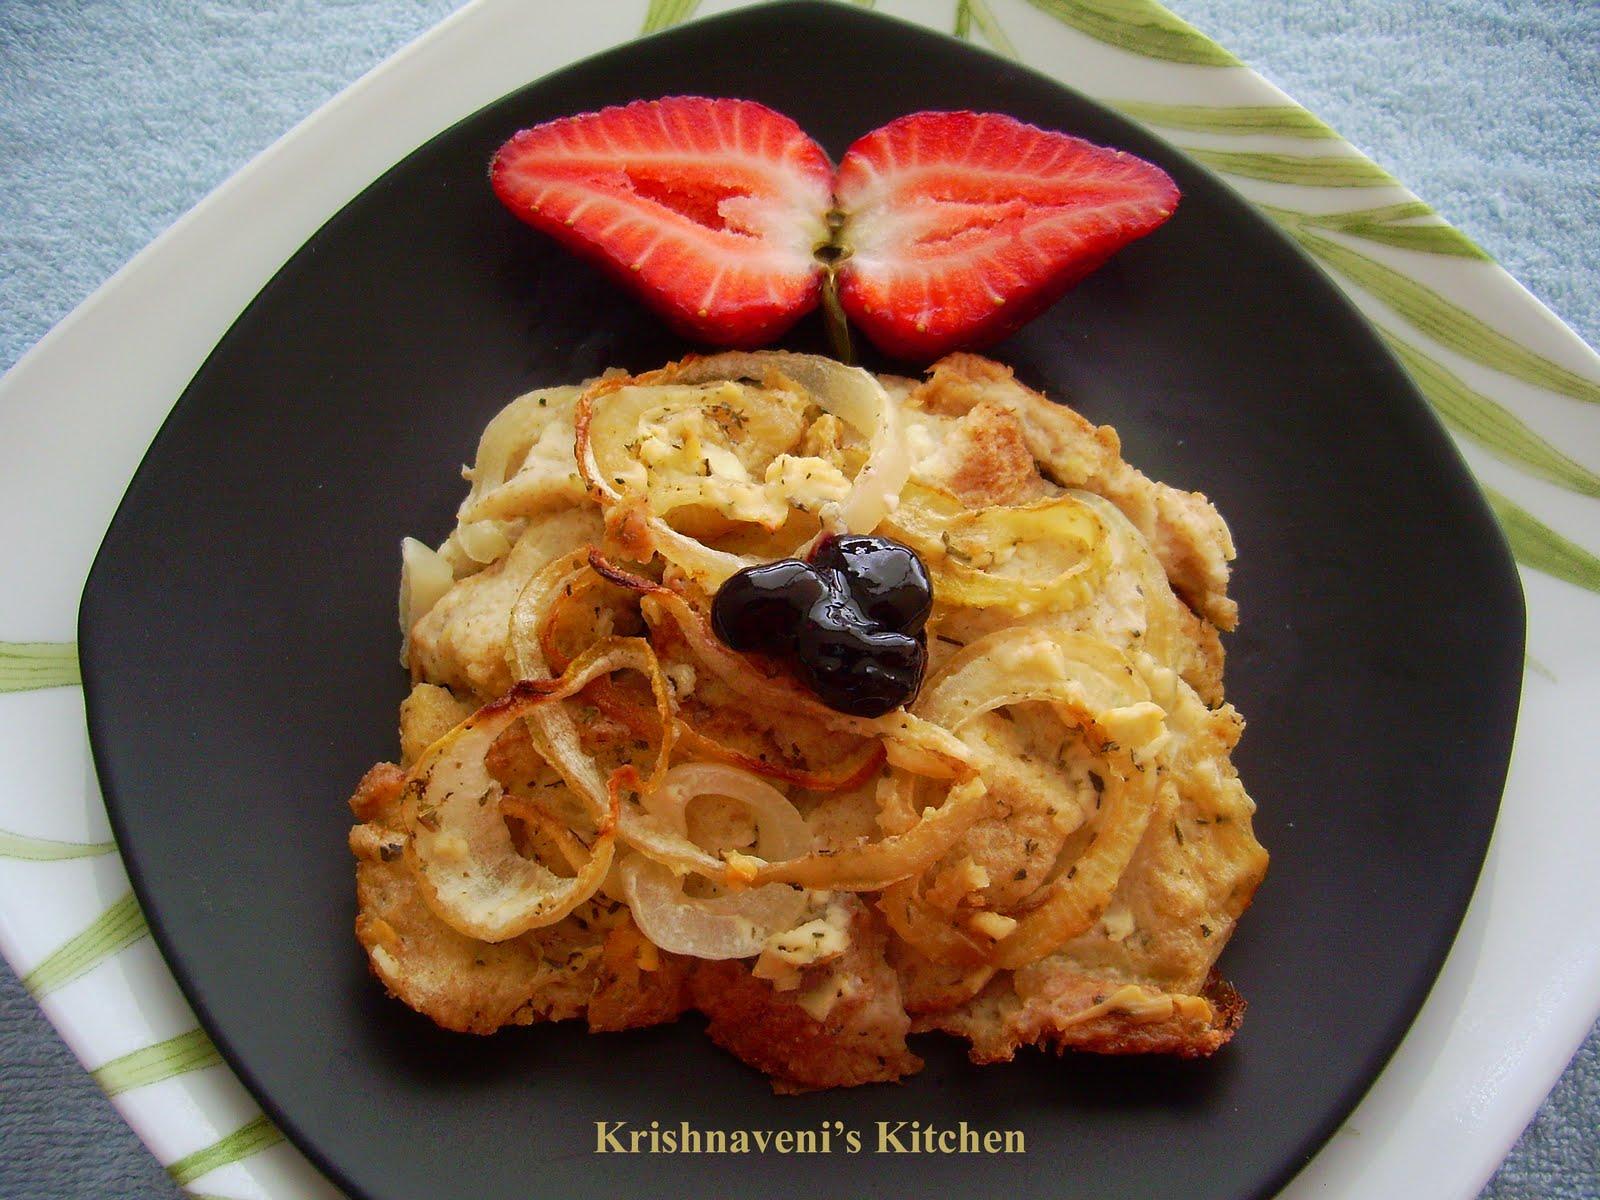 Krishnaveni's Kitchen: Low Fat Onion Bread Pudding